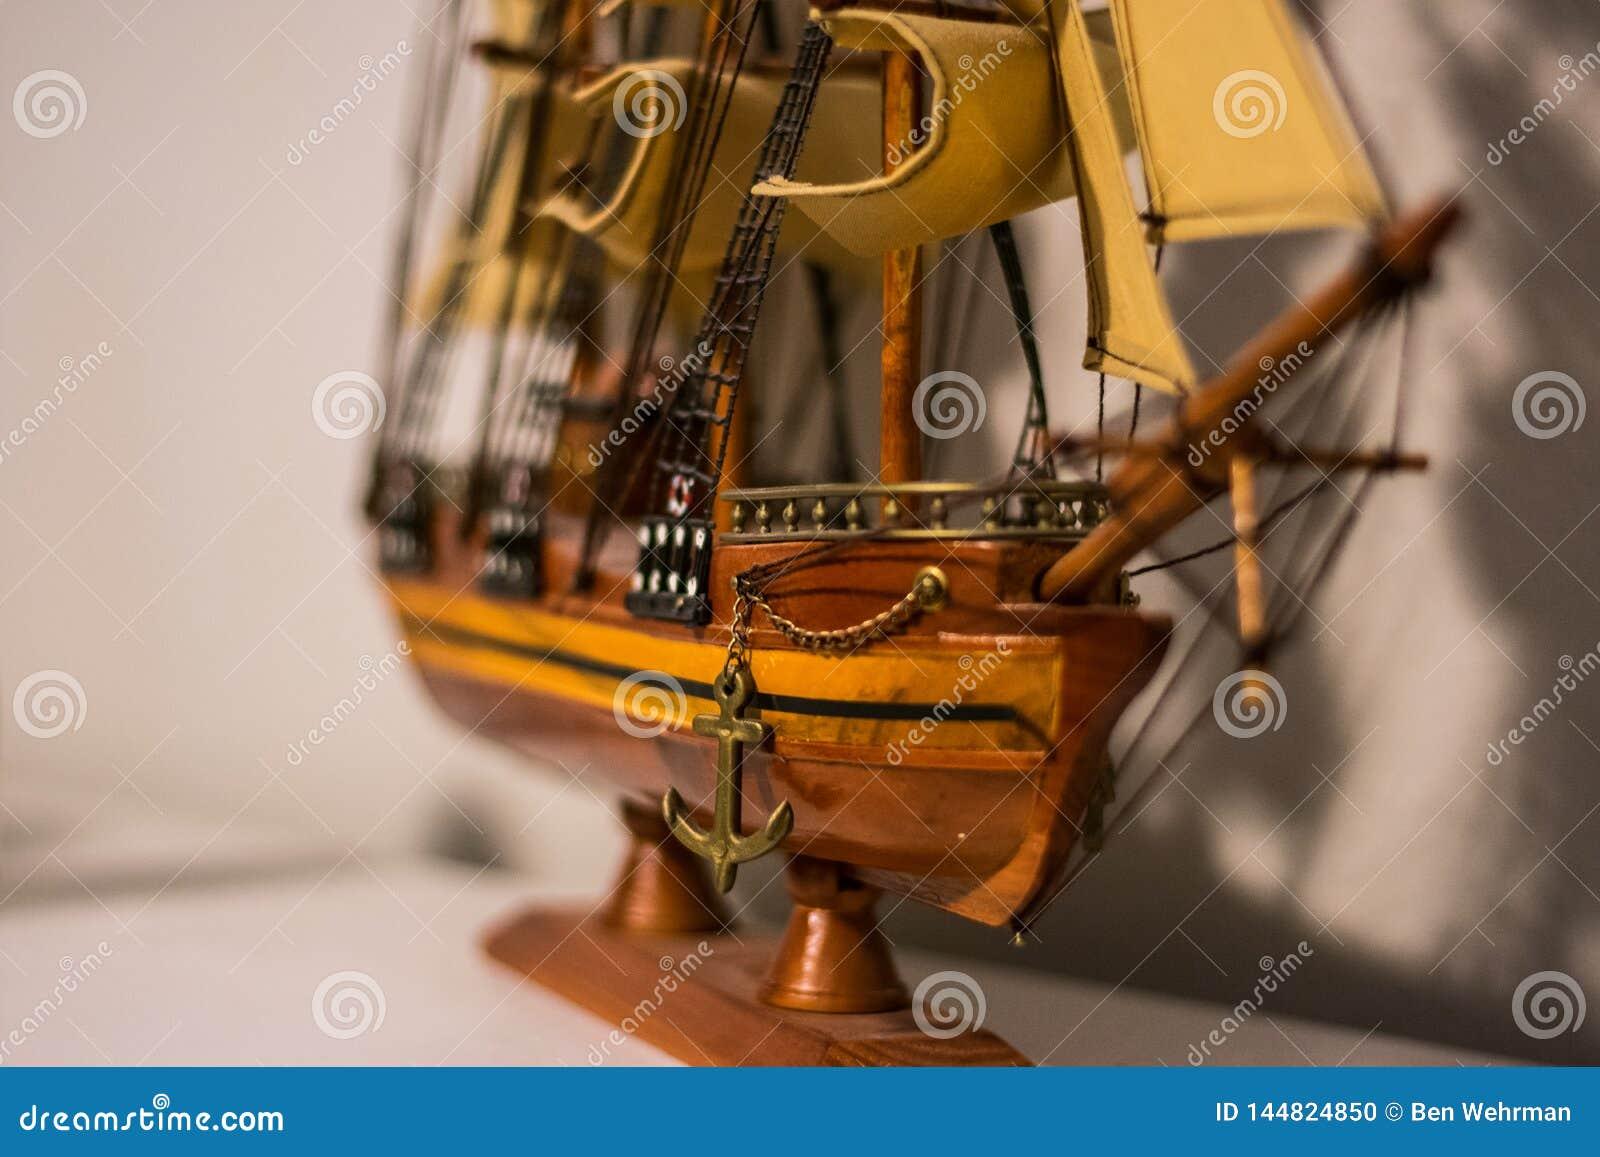 Modell Pirate Ship